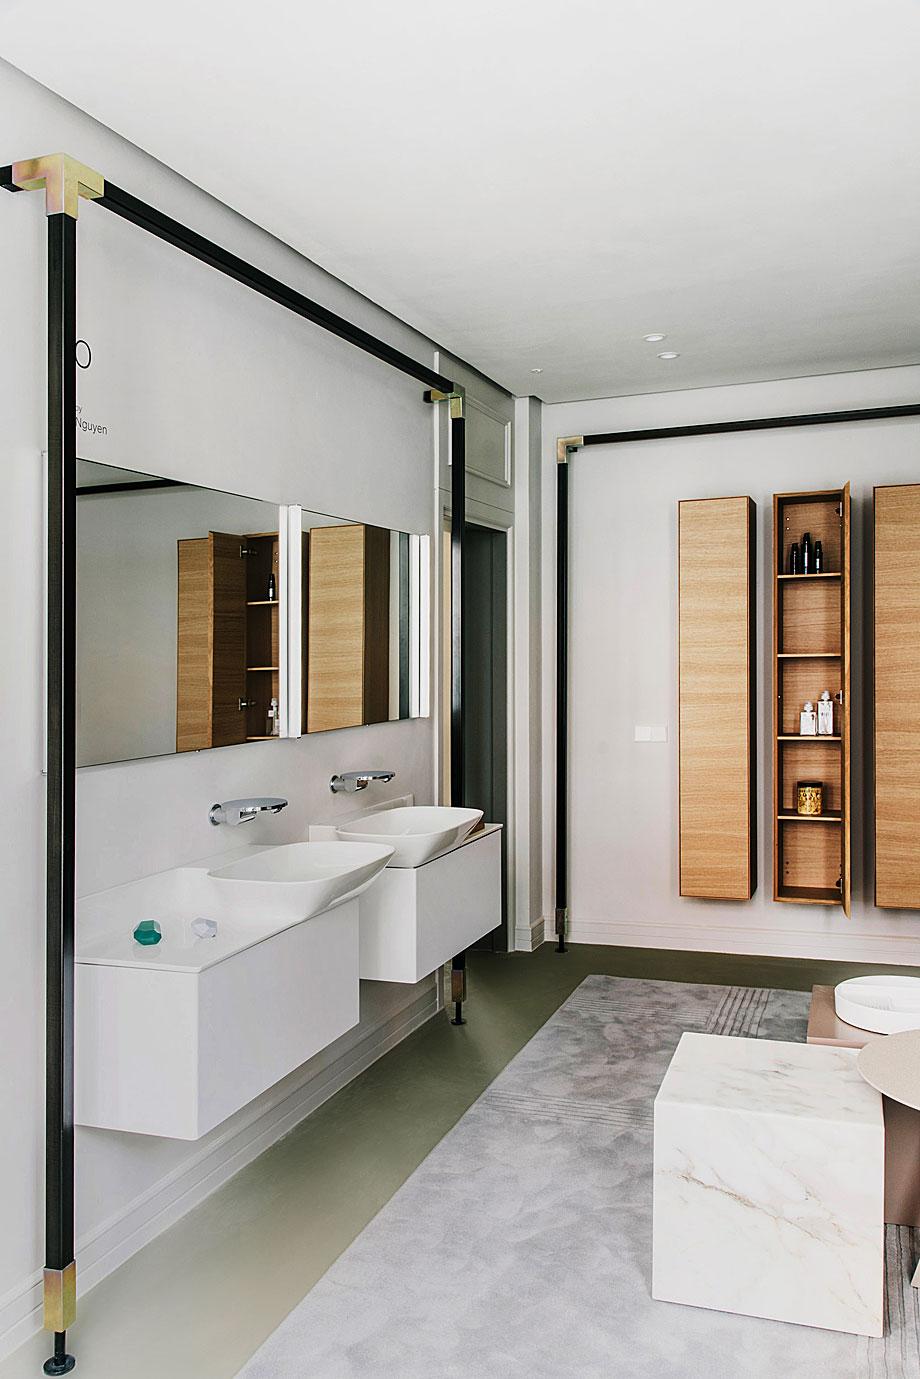 laufen-showroom-baños-madrid-patricia-urquiola (12)